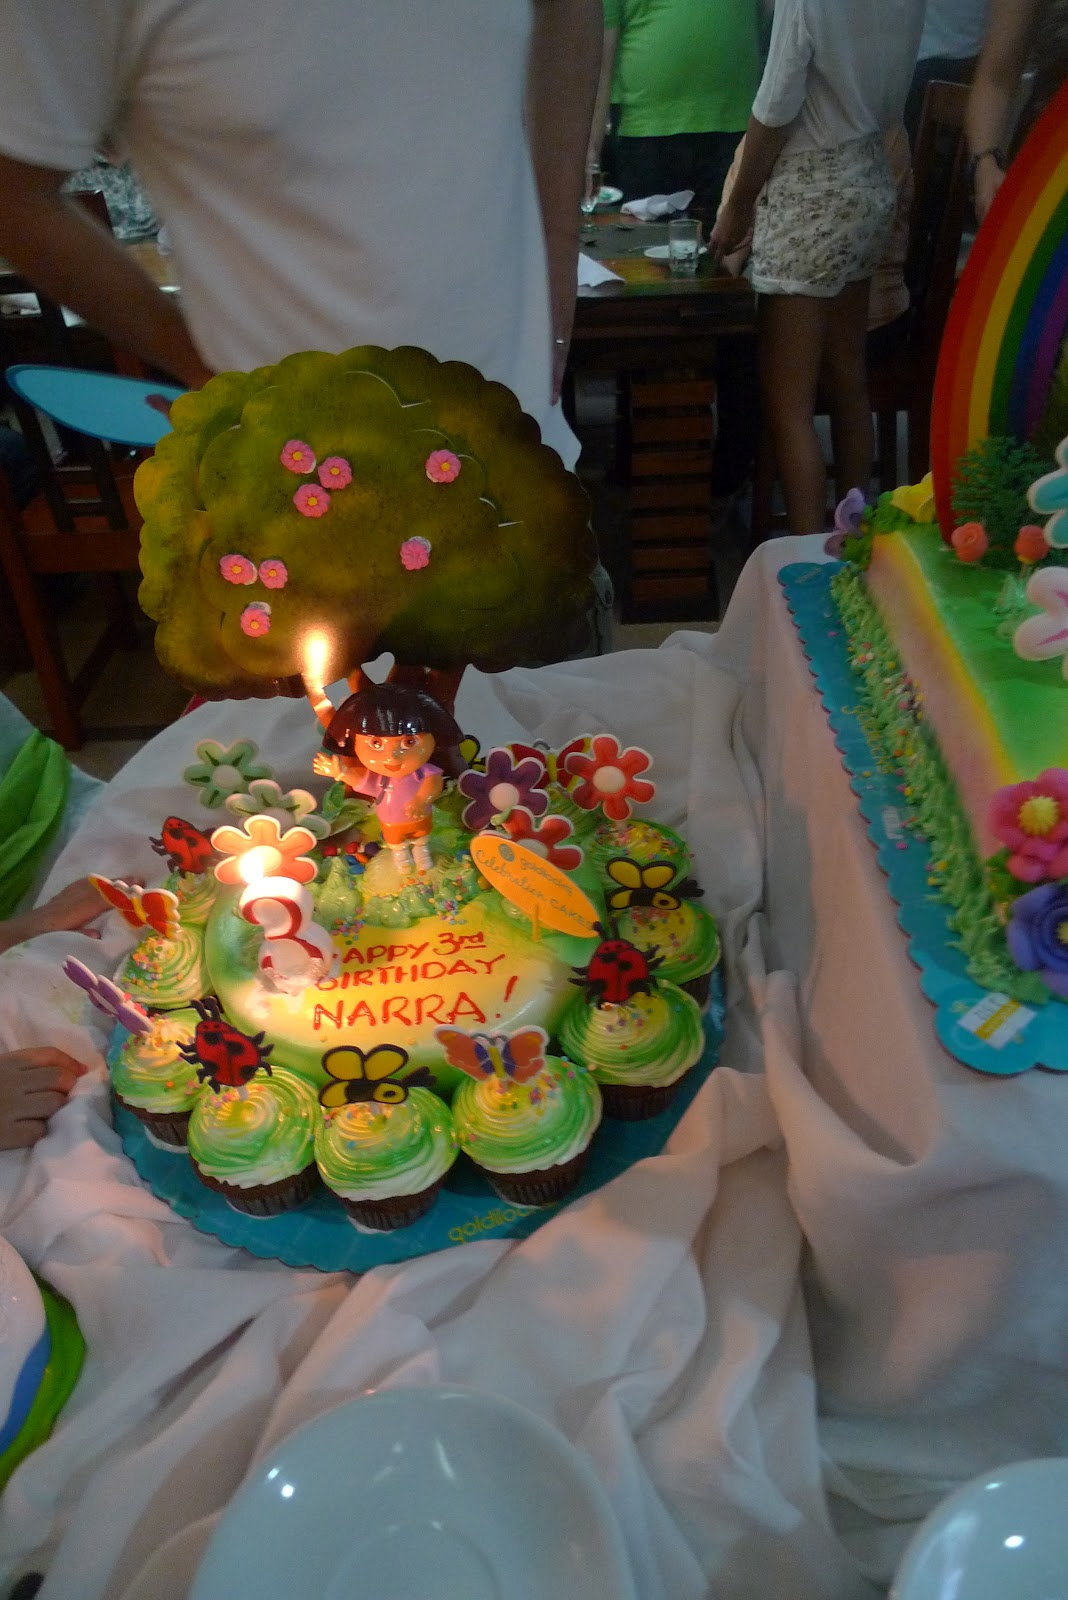 Nikkis Nurturance On Goldilocks Birthday Cakes Reflections Of An